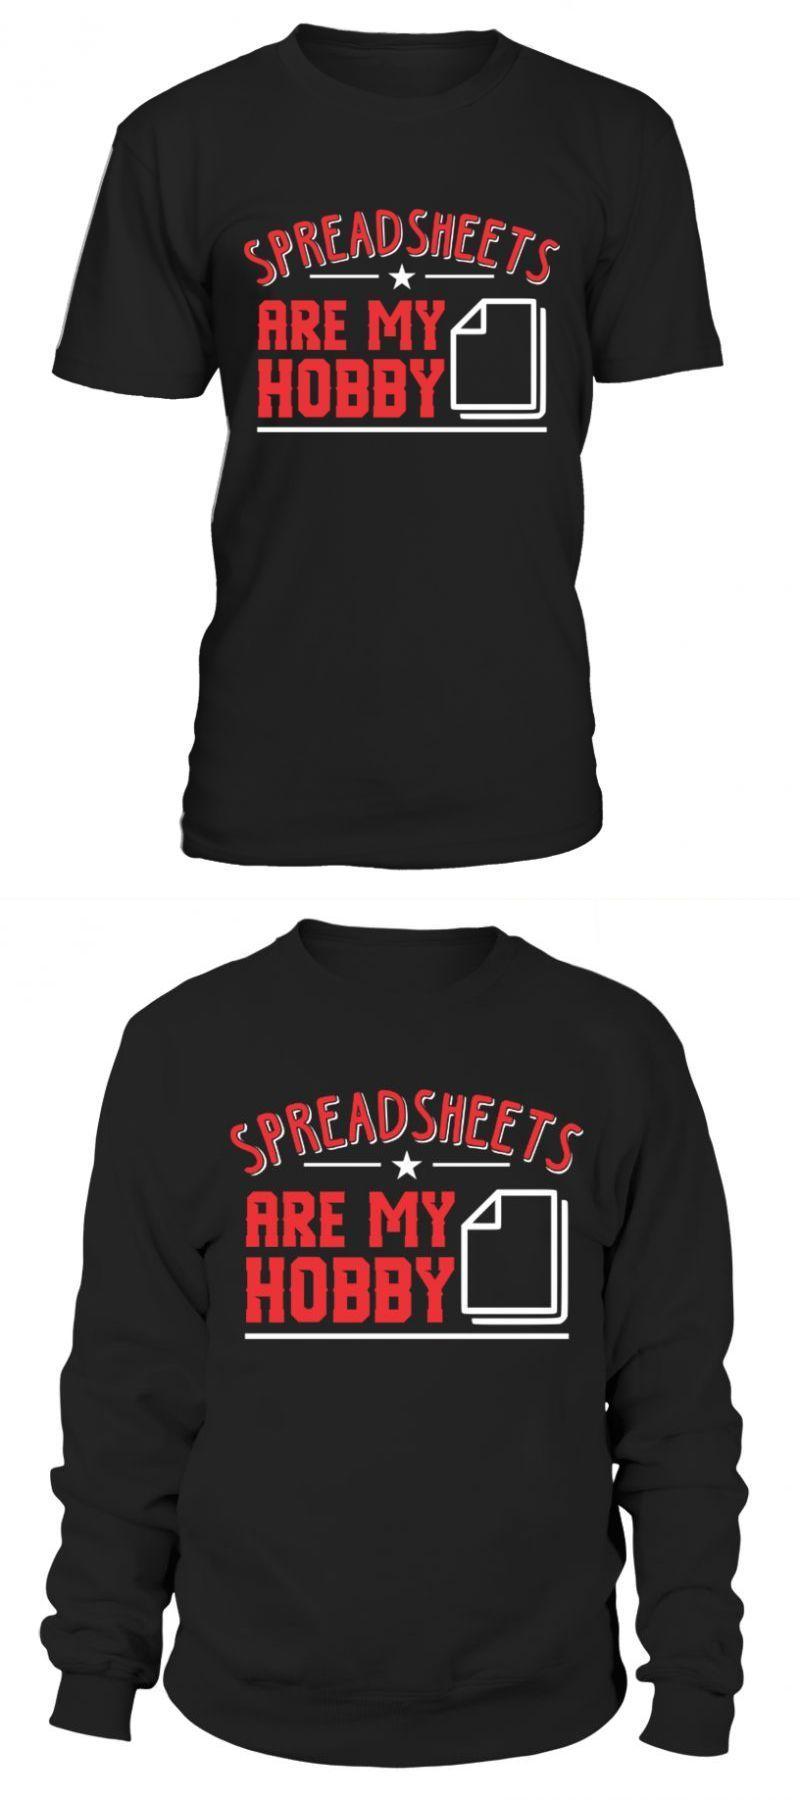 Beautiful Spreadsheet Is My Hobby T Shir T Shirt Handball 2017 Beautiful Spreadsheet Is My Hobby T Shir Shirt Handball 2017 T Shirts Handball T Shirt